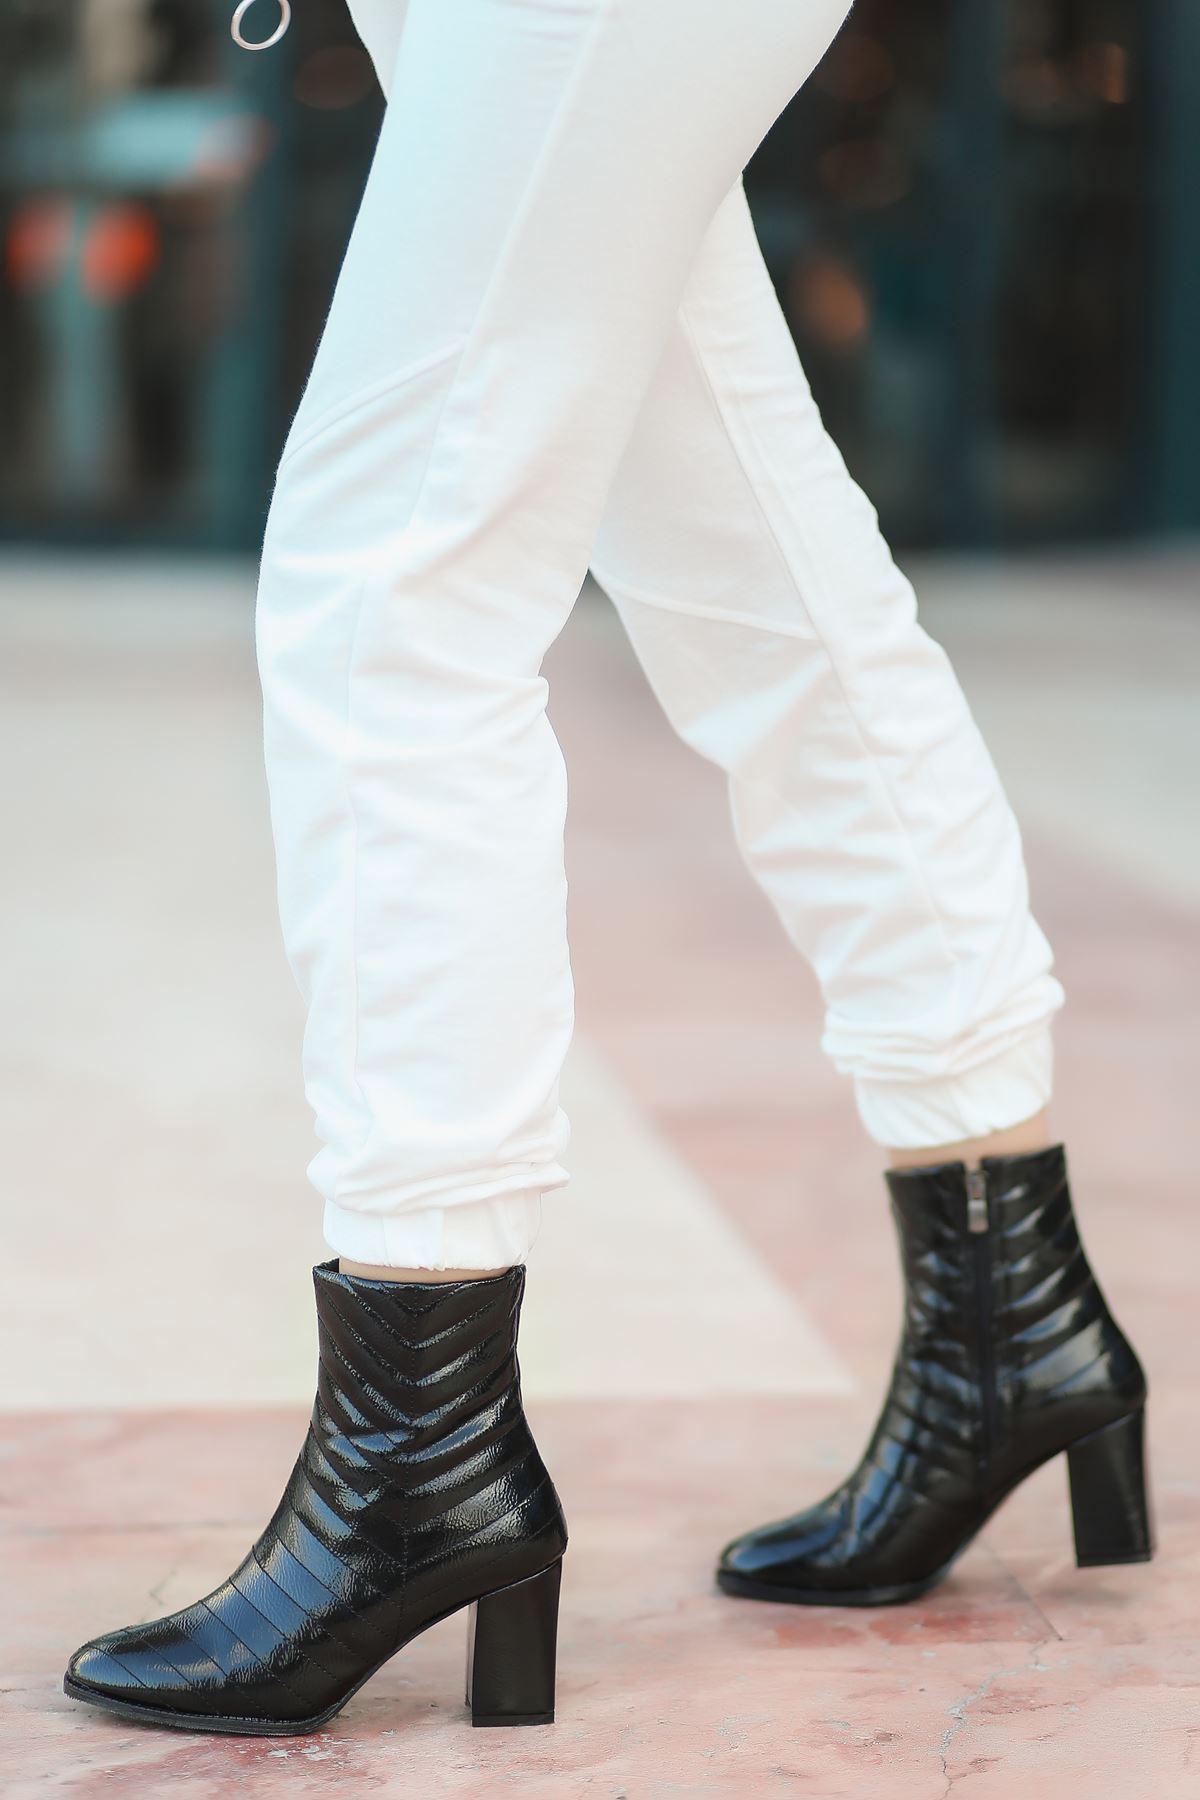 Charm Dikiş Detaylı Yüksek Topuk Siyah Rugan Kadın Bot